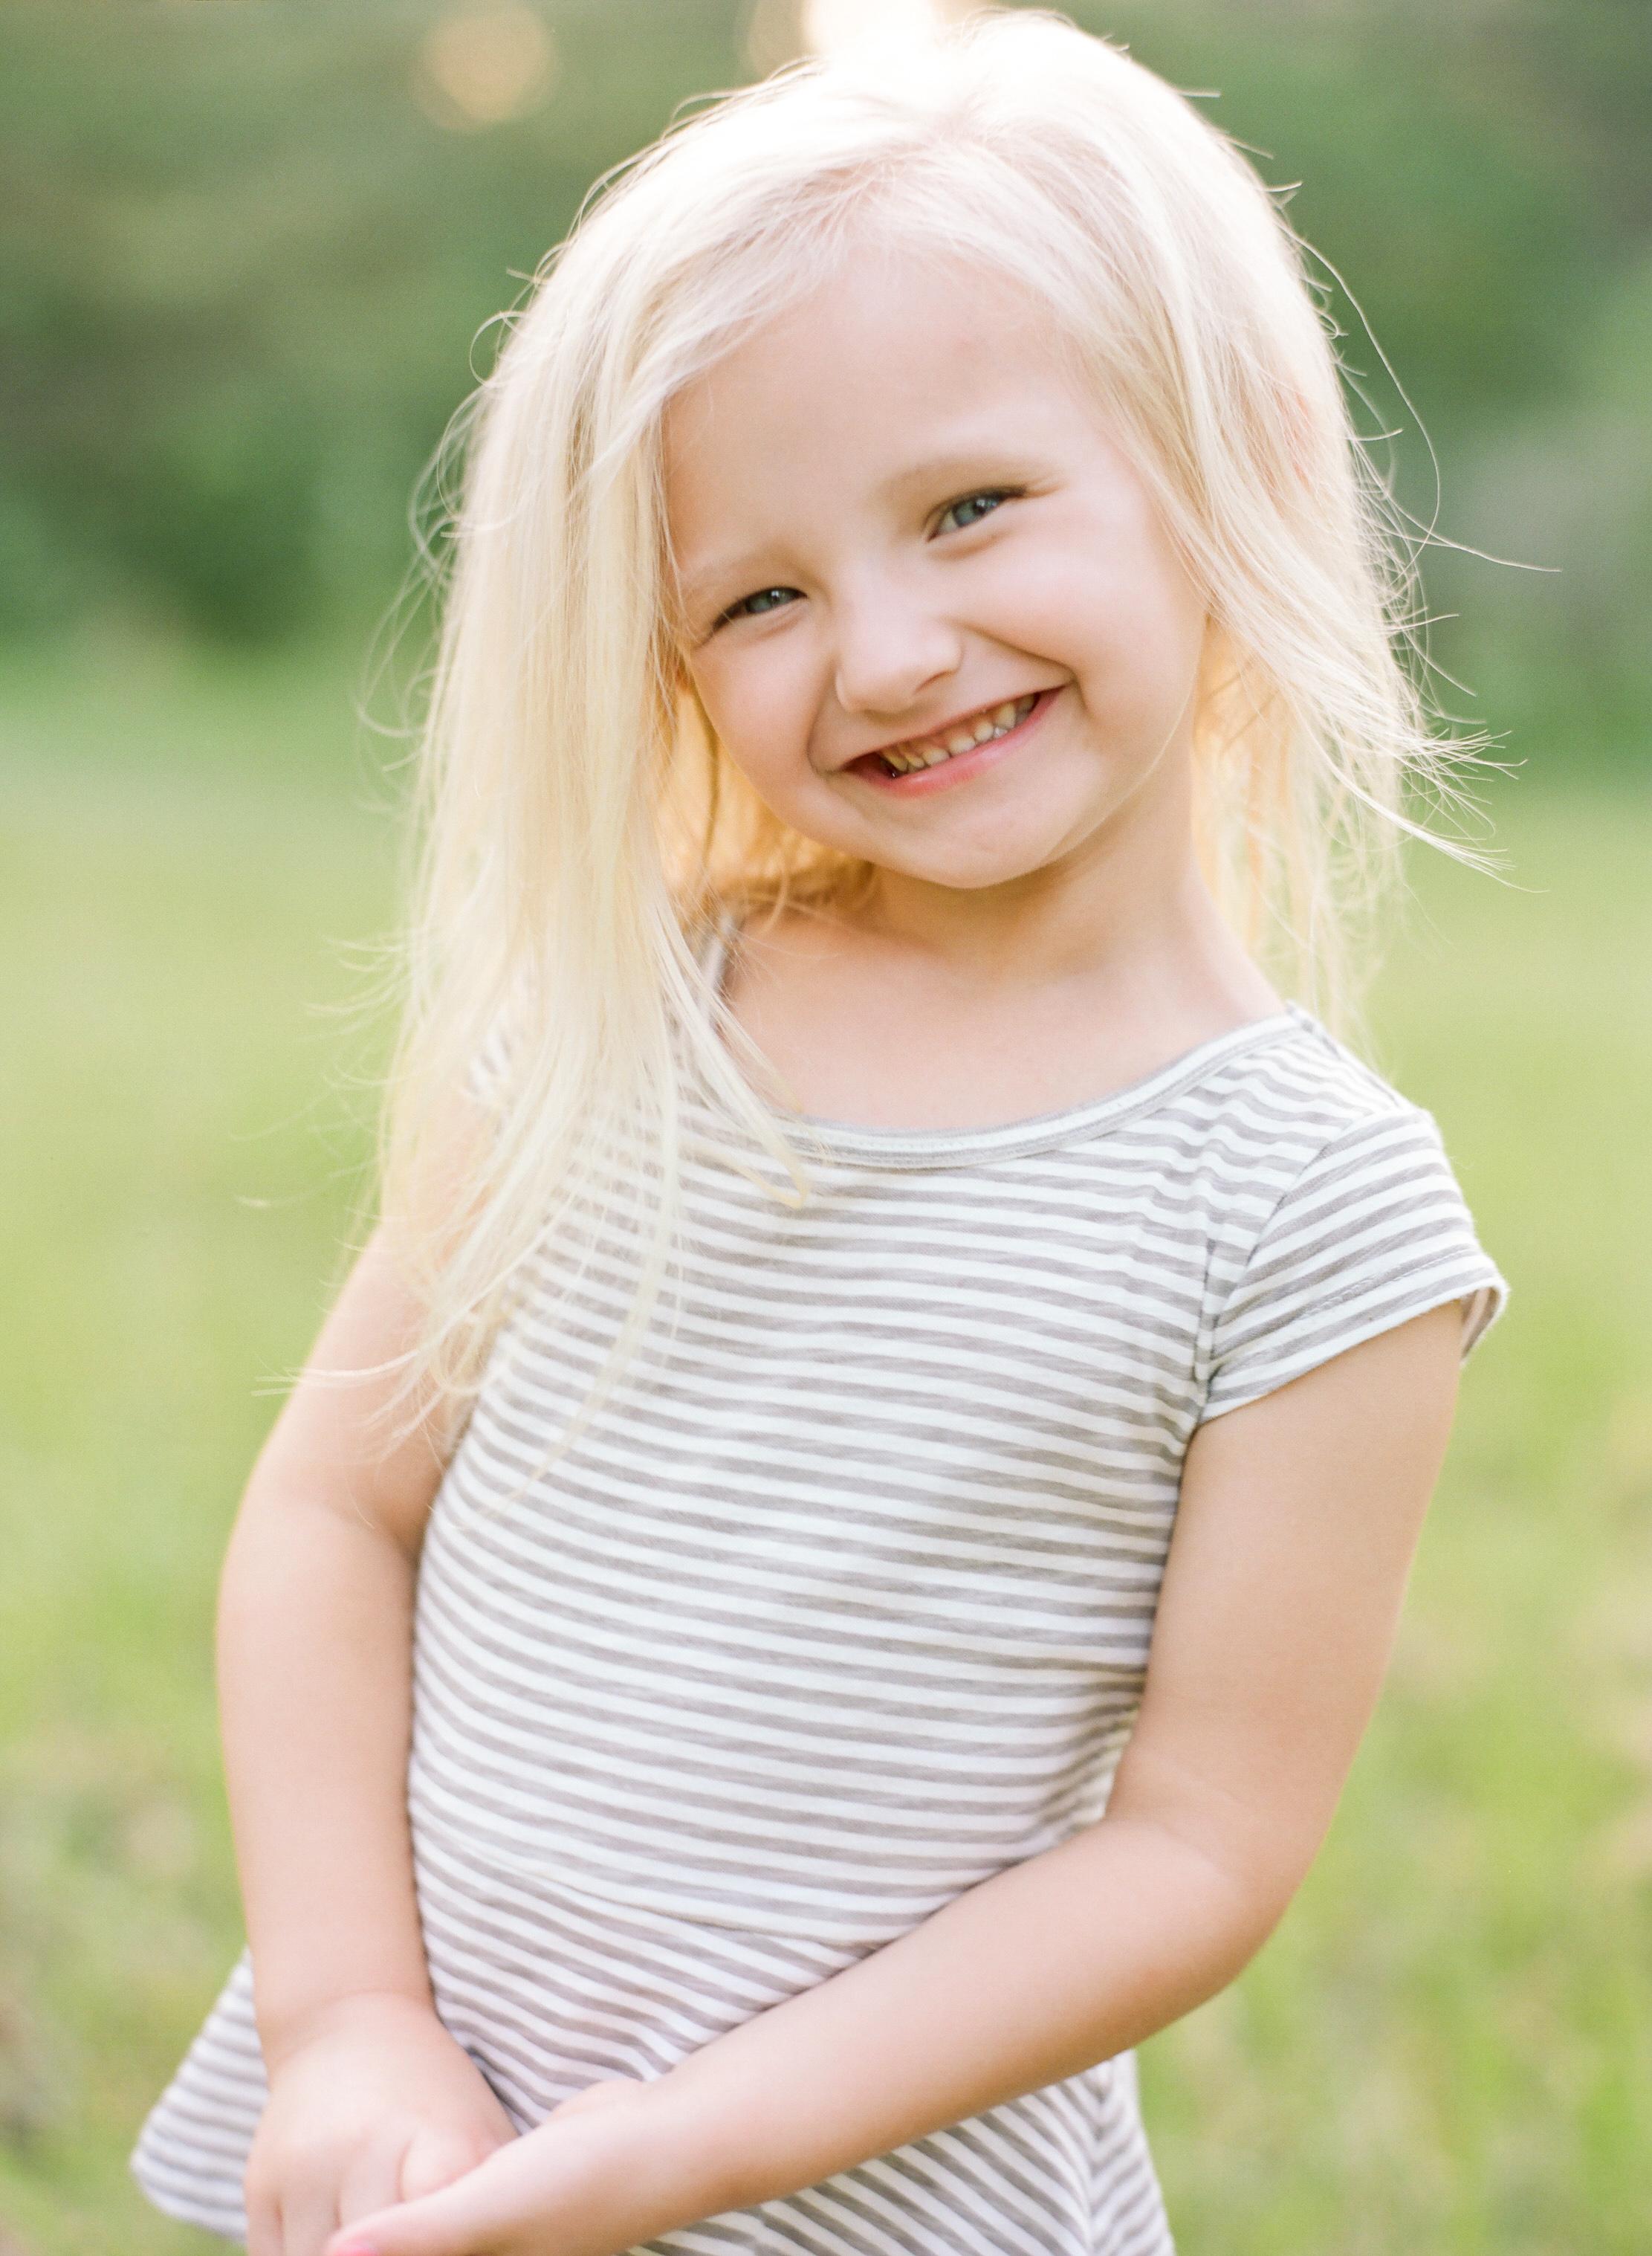 Dana-Fernandez-Photography-Houston-Portrait-Photographer-Film-Children-Family-Maternity-Senior-Photographer-10.jpg